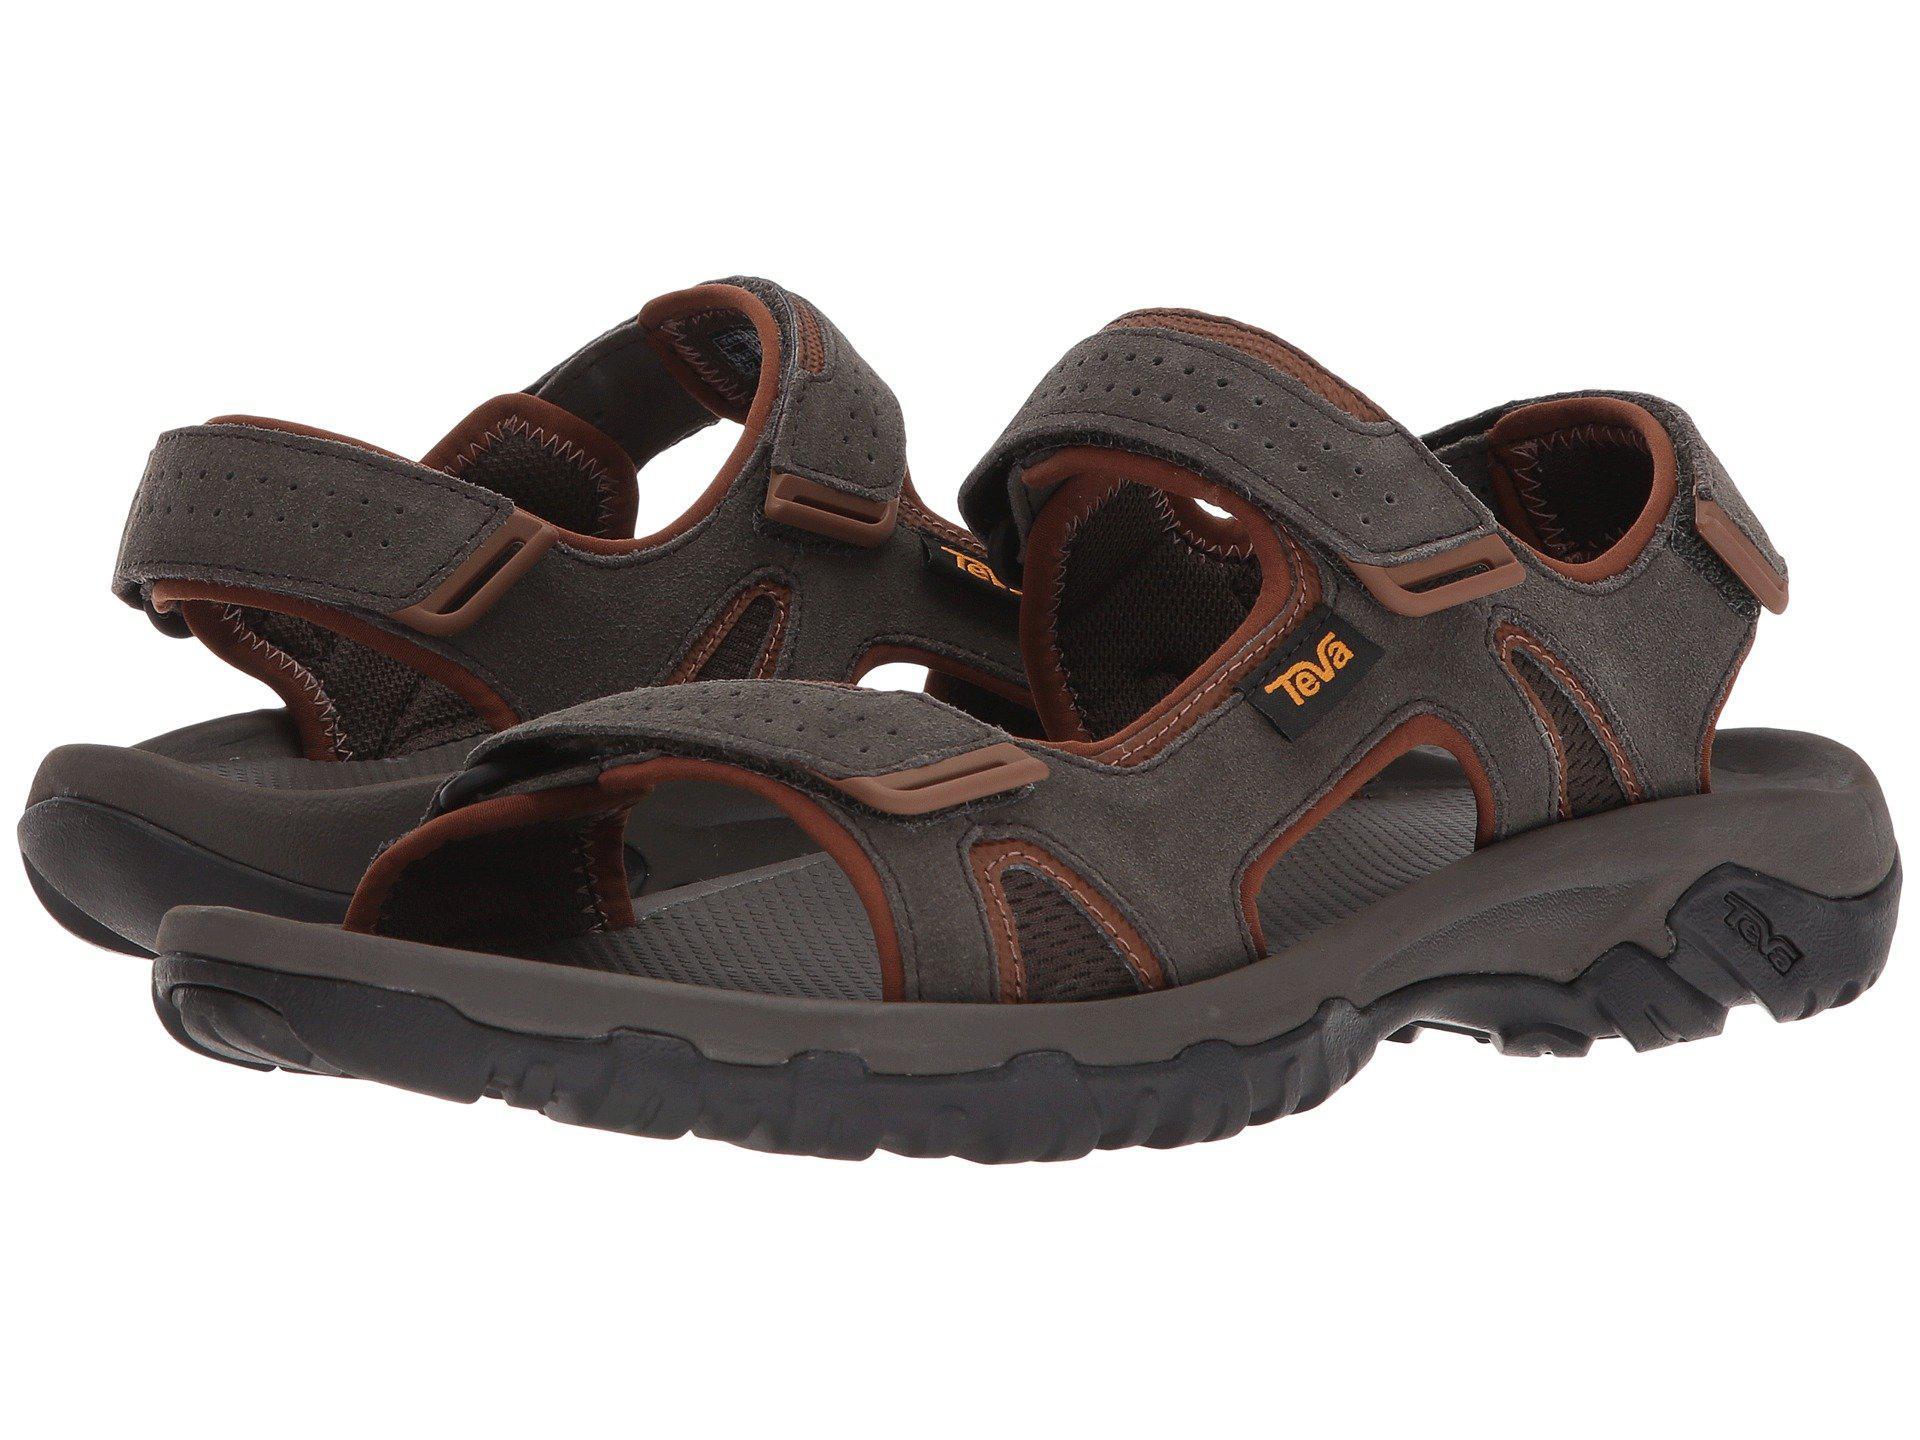 ff2639550228 Lyst - Teva Katavi 2 (walnut) Men s Shoes in Black for Men